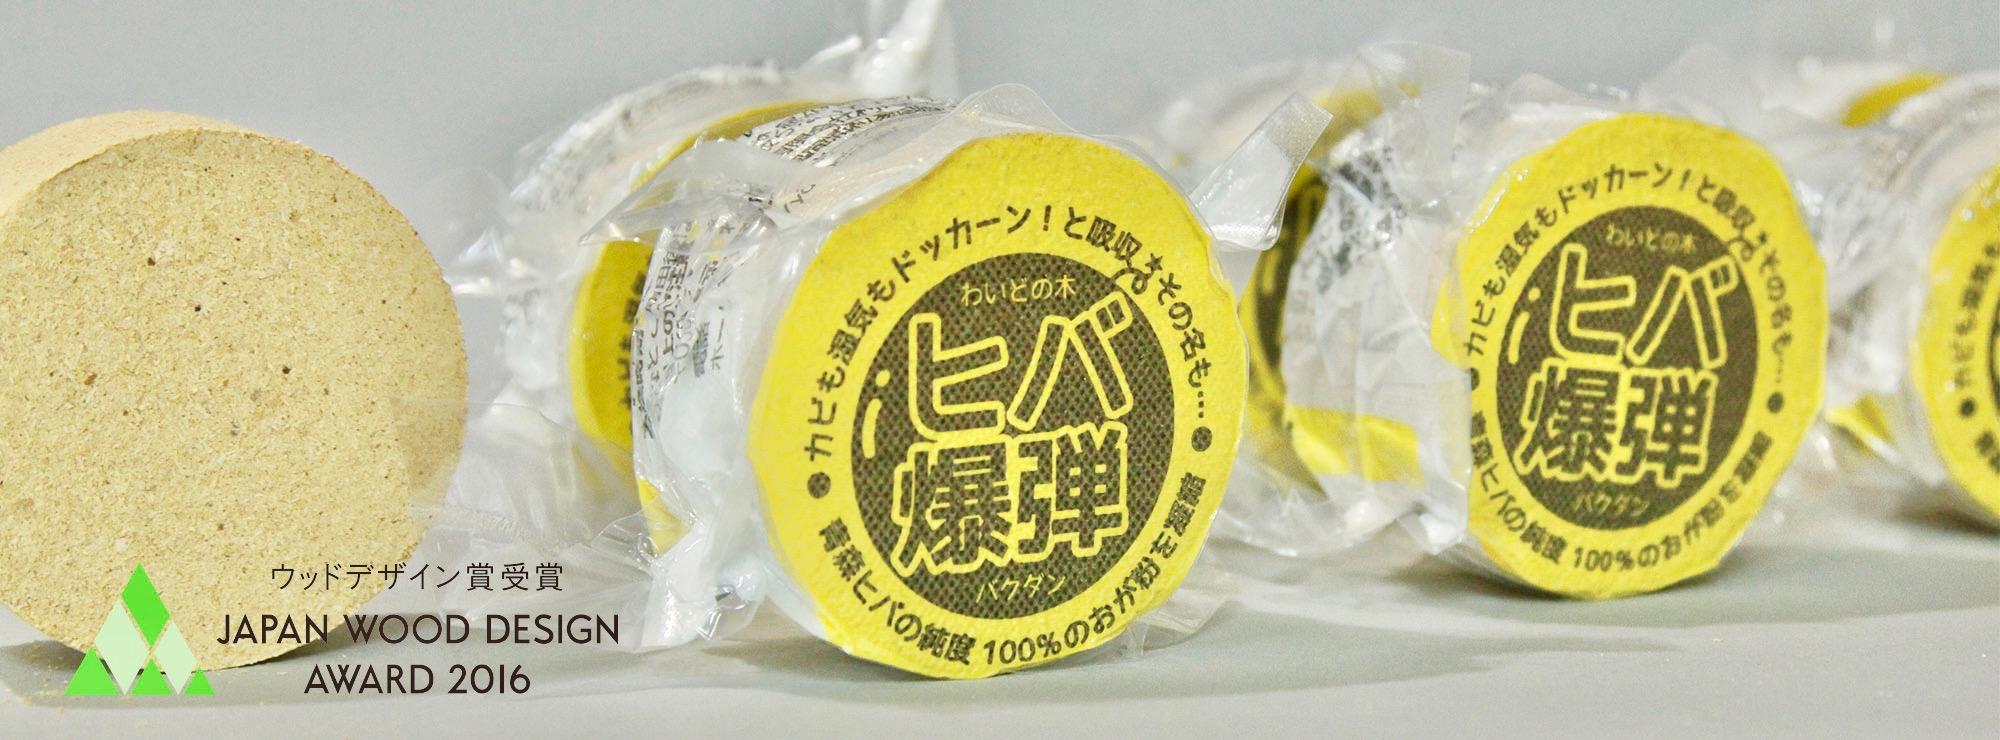 青森ヒバ爆弾